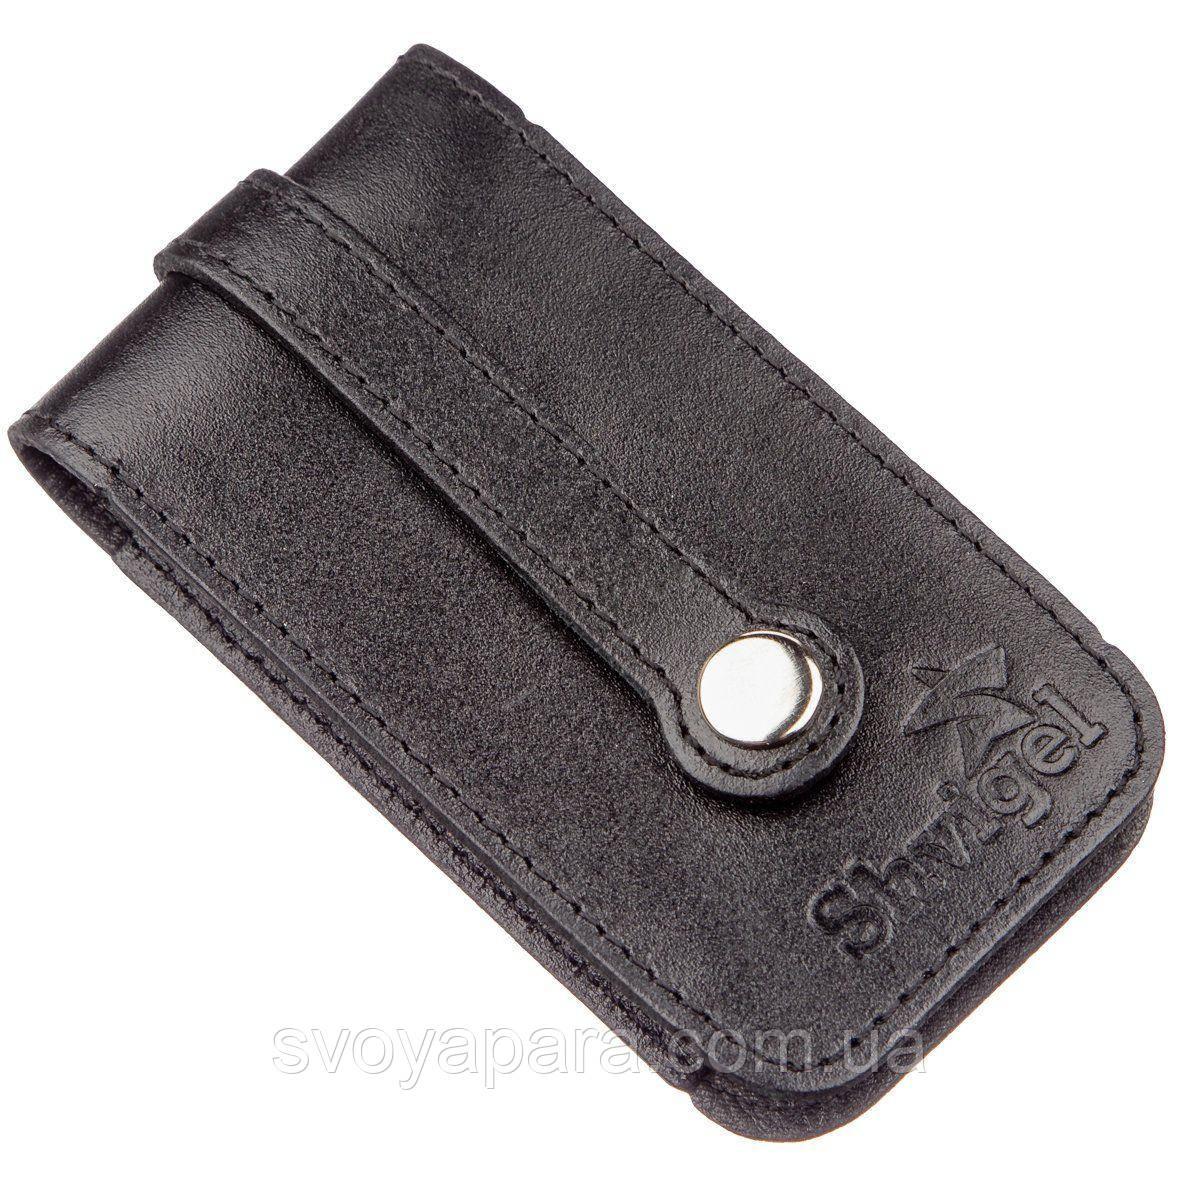 Компактная кожаная ключница SHVIGEL 13961 Черная